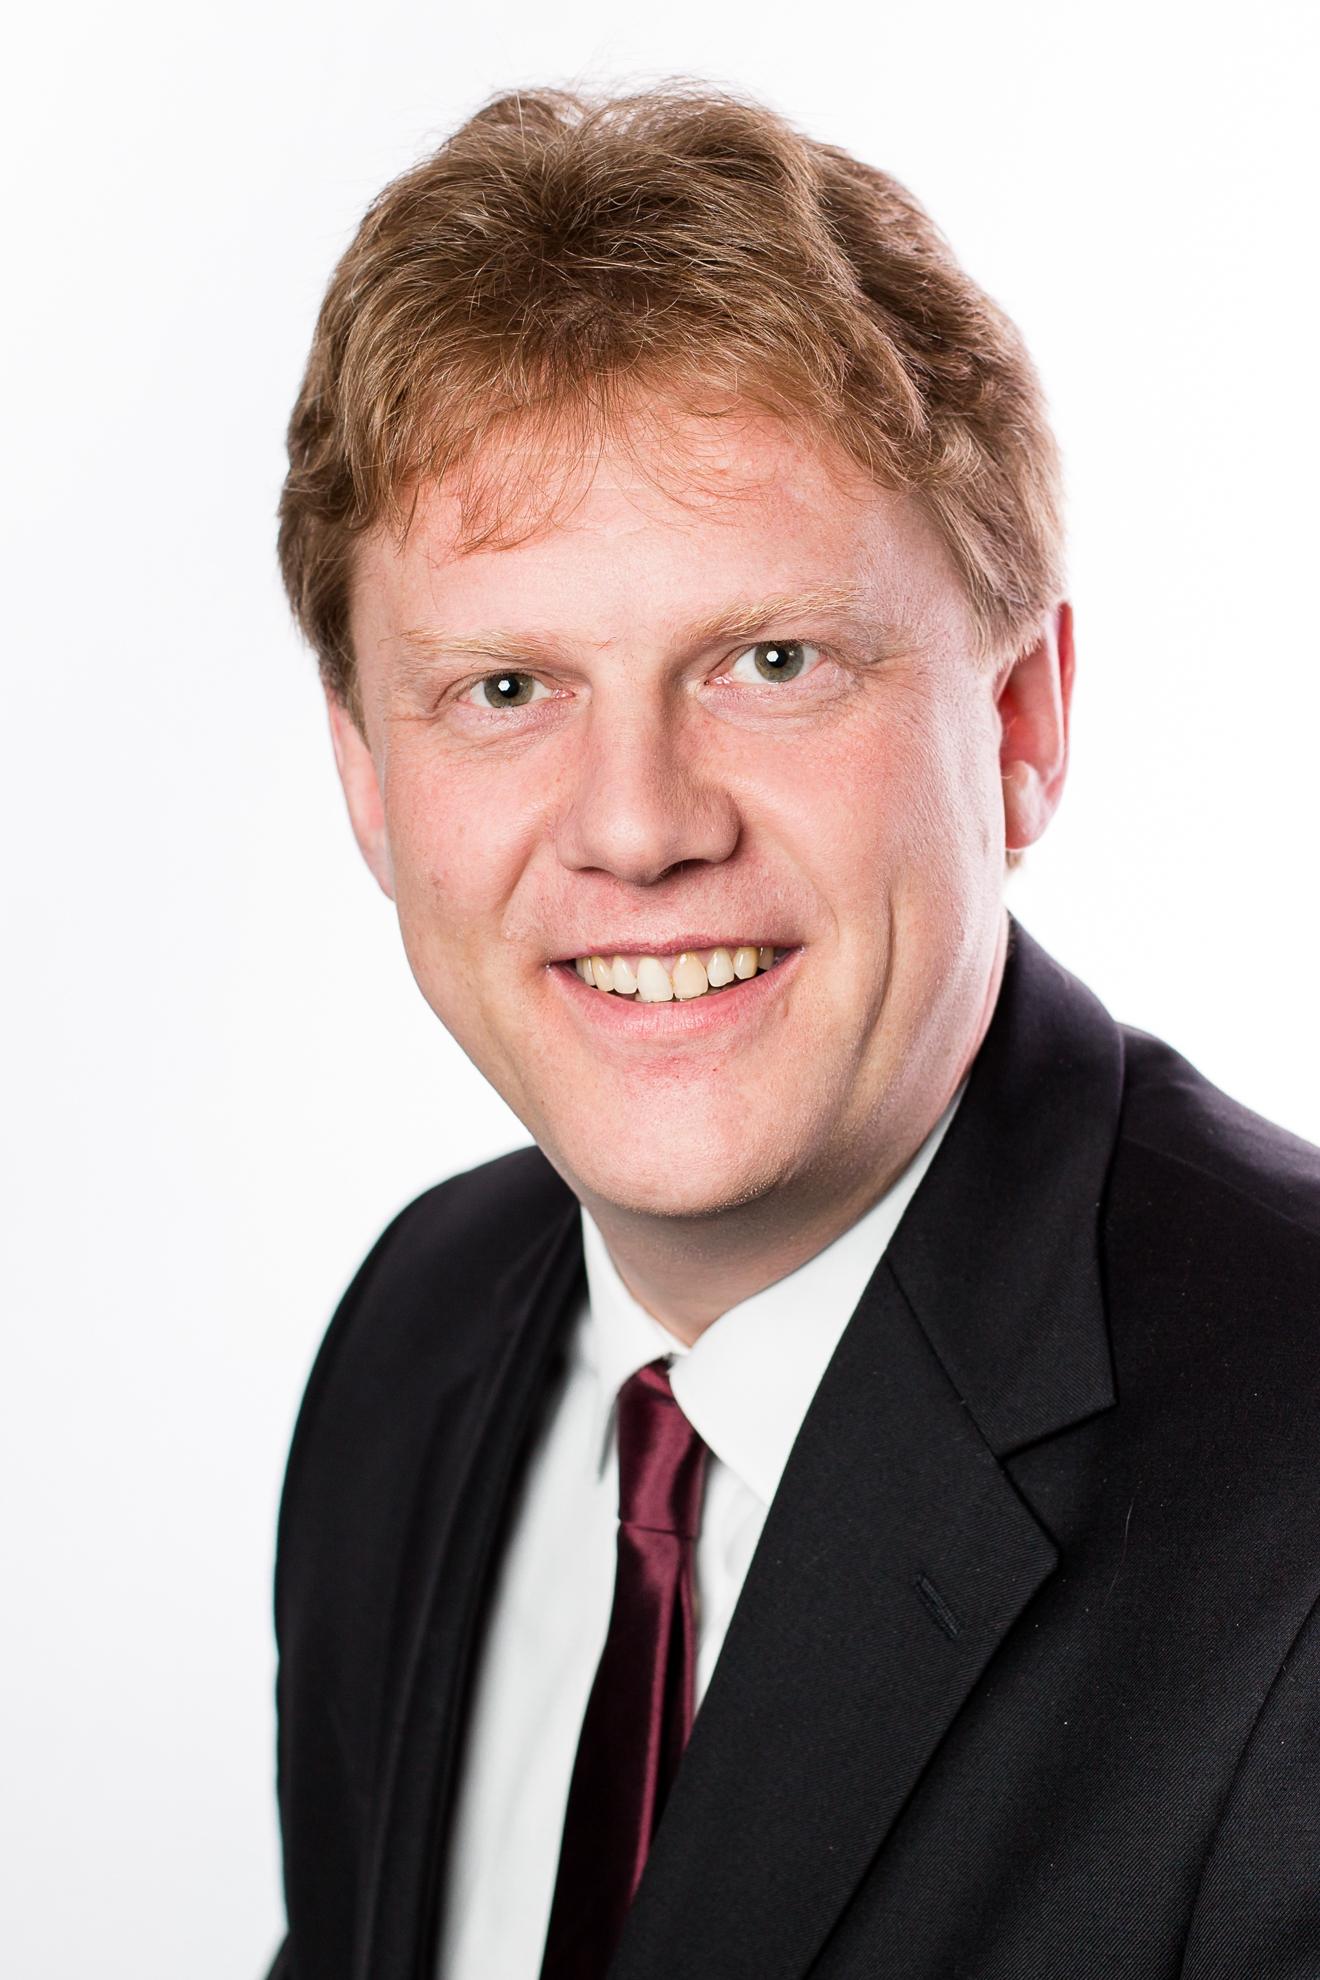 Christoph Dödtmann